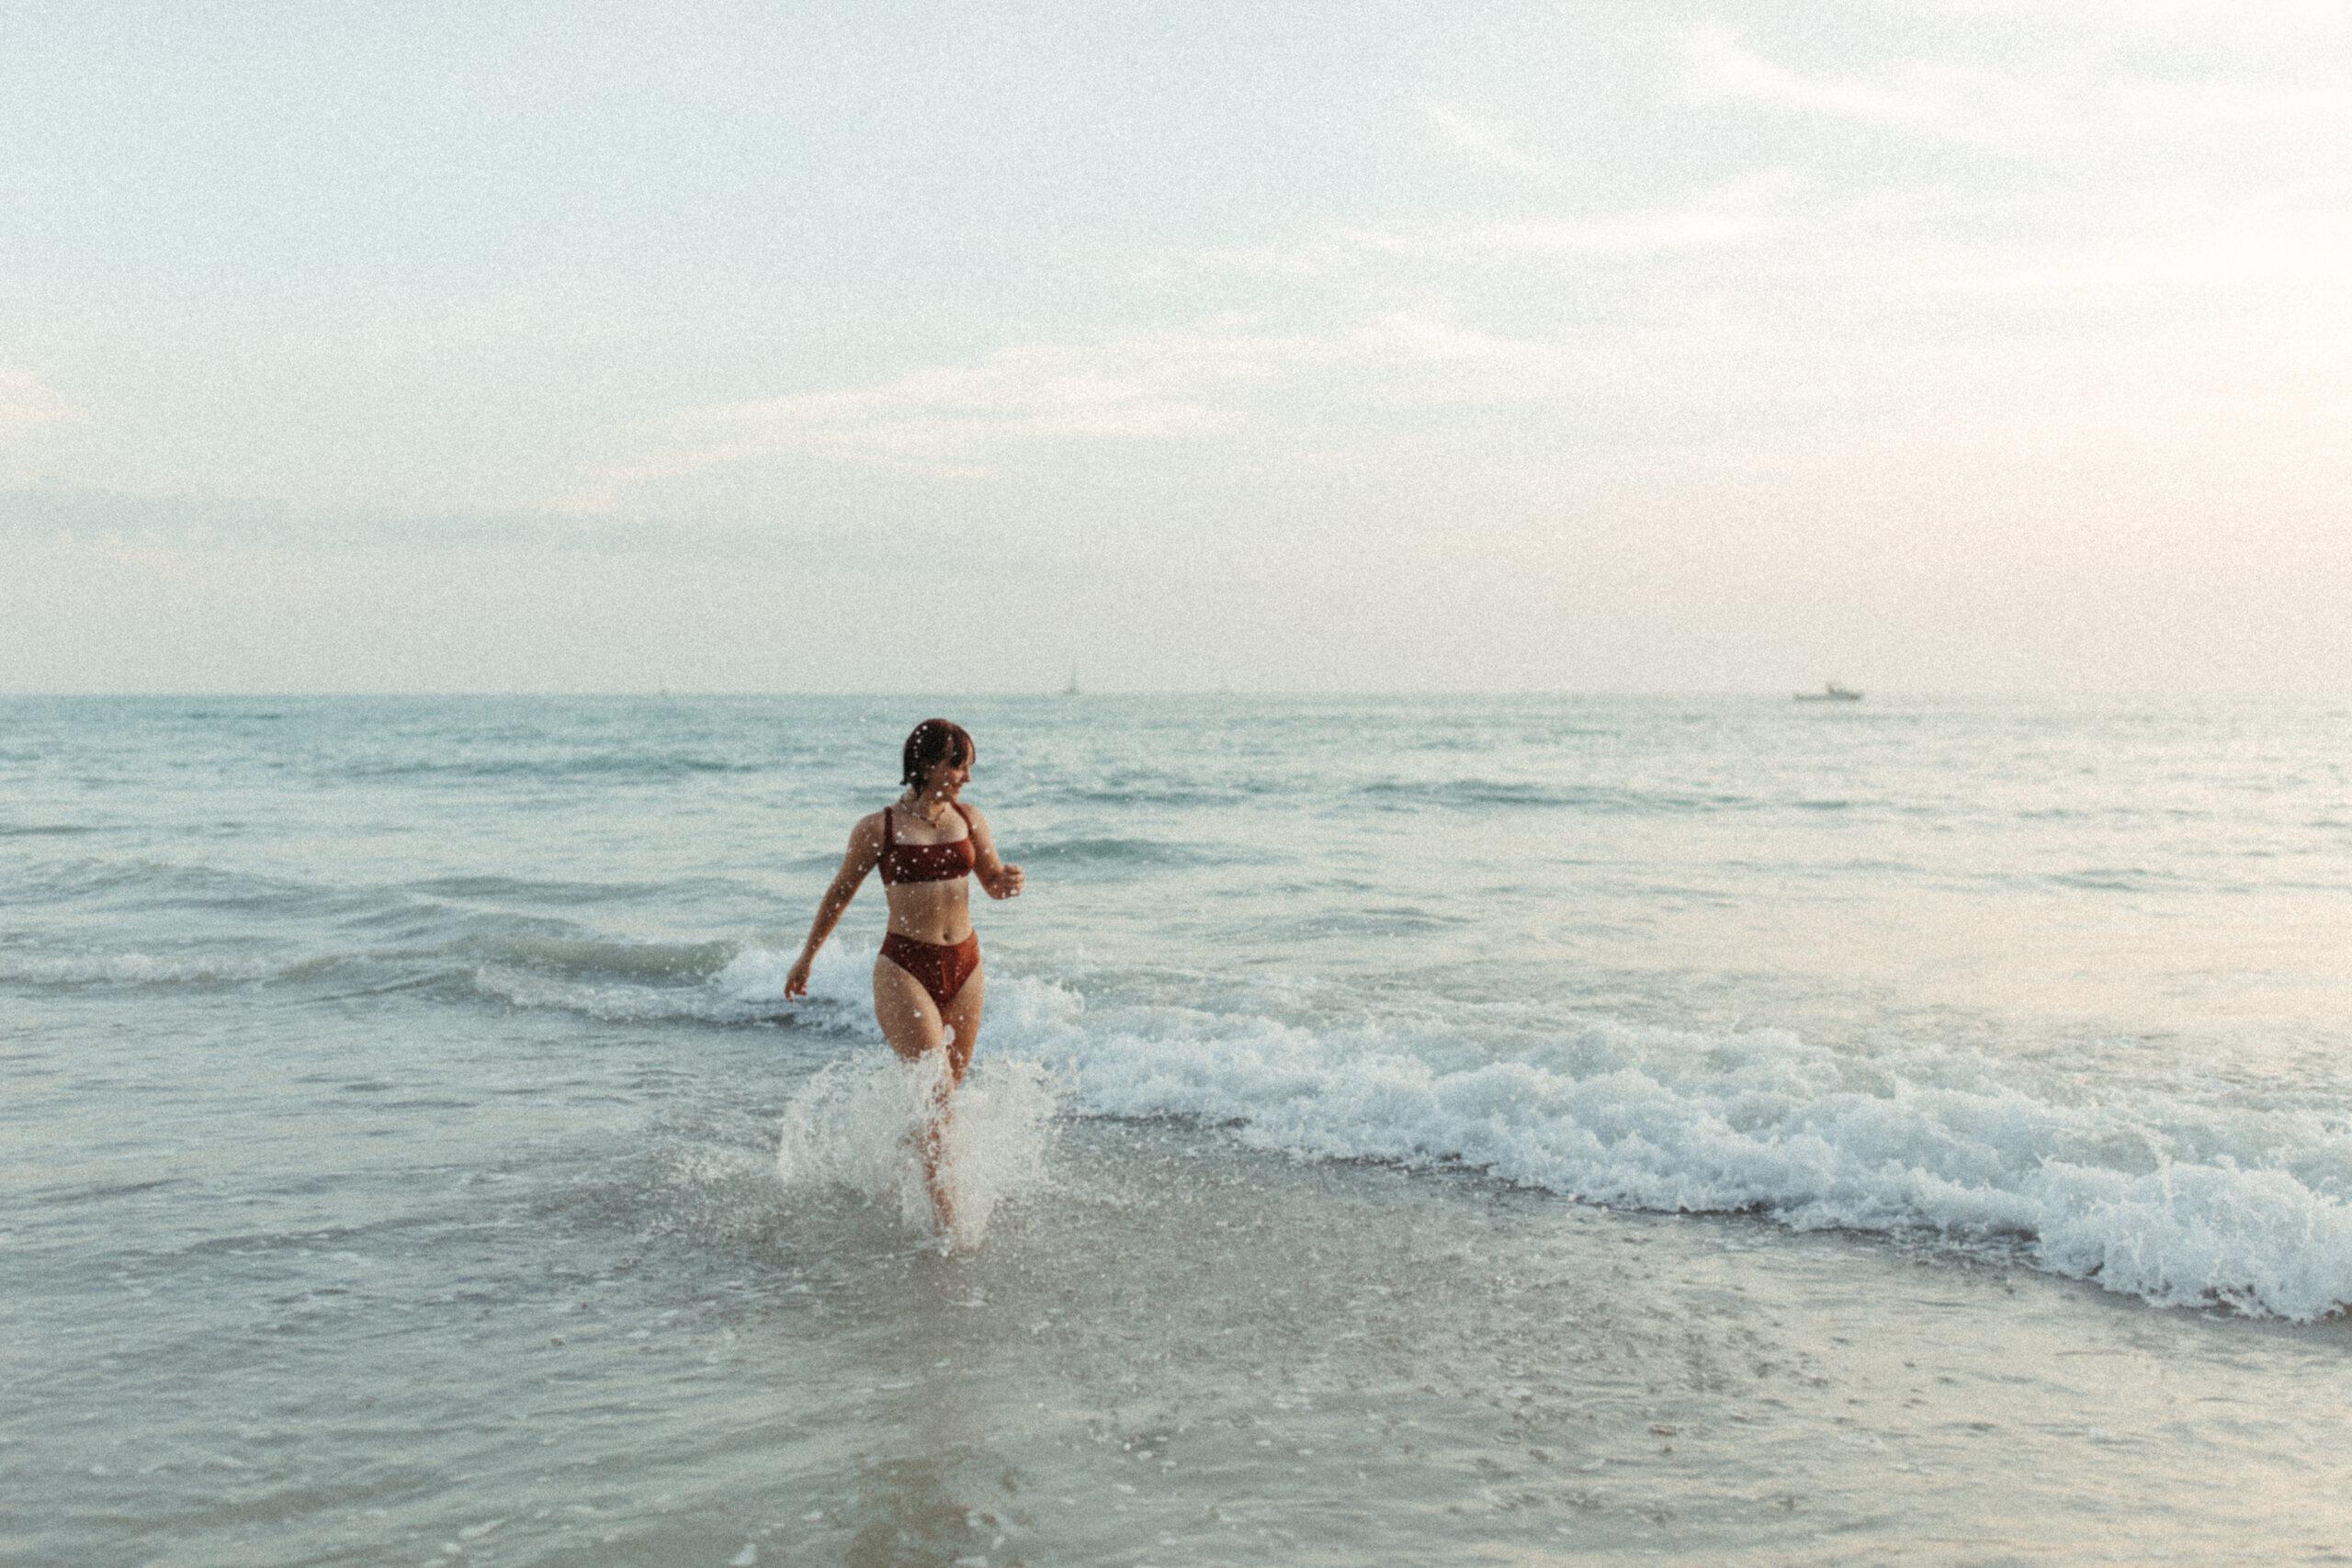 Teenage girl runs in the ocean in Venice Beach, Florida